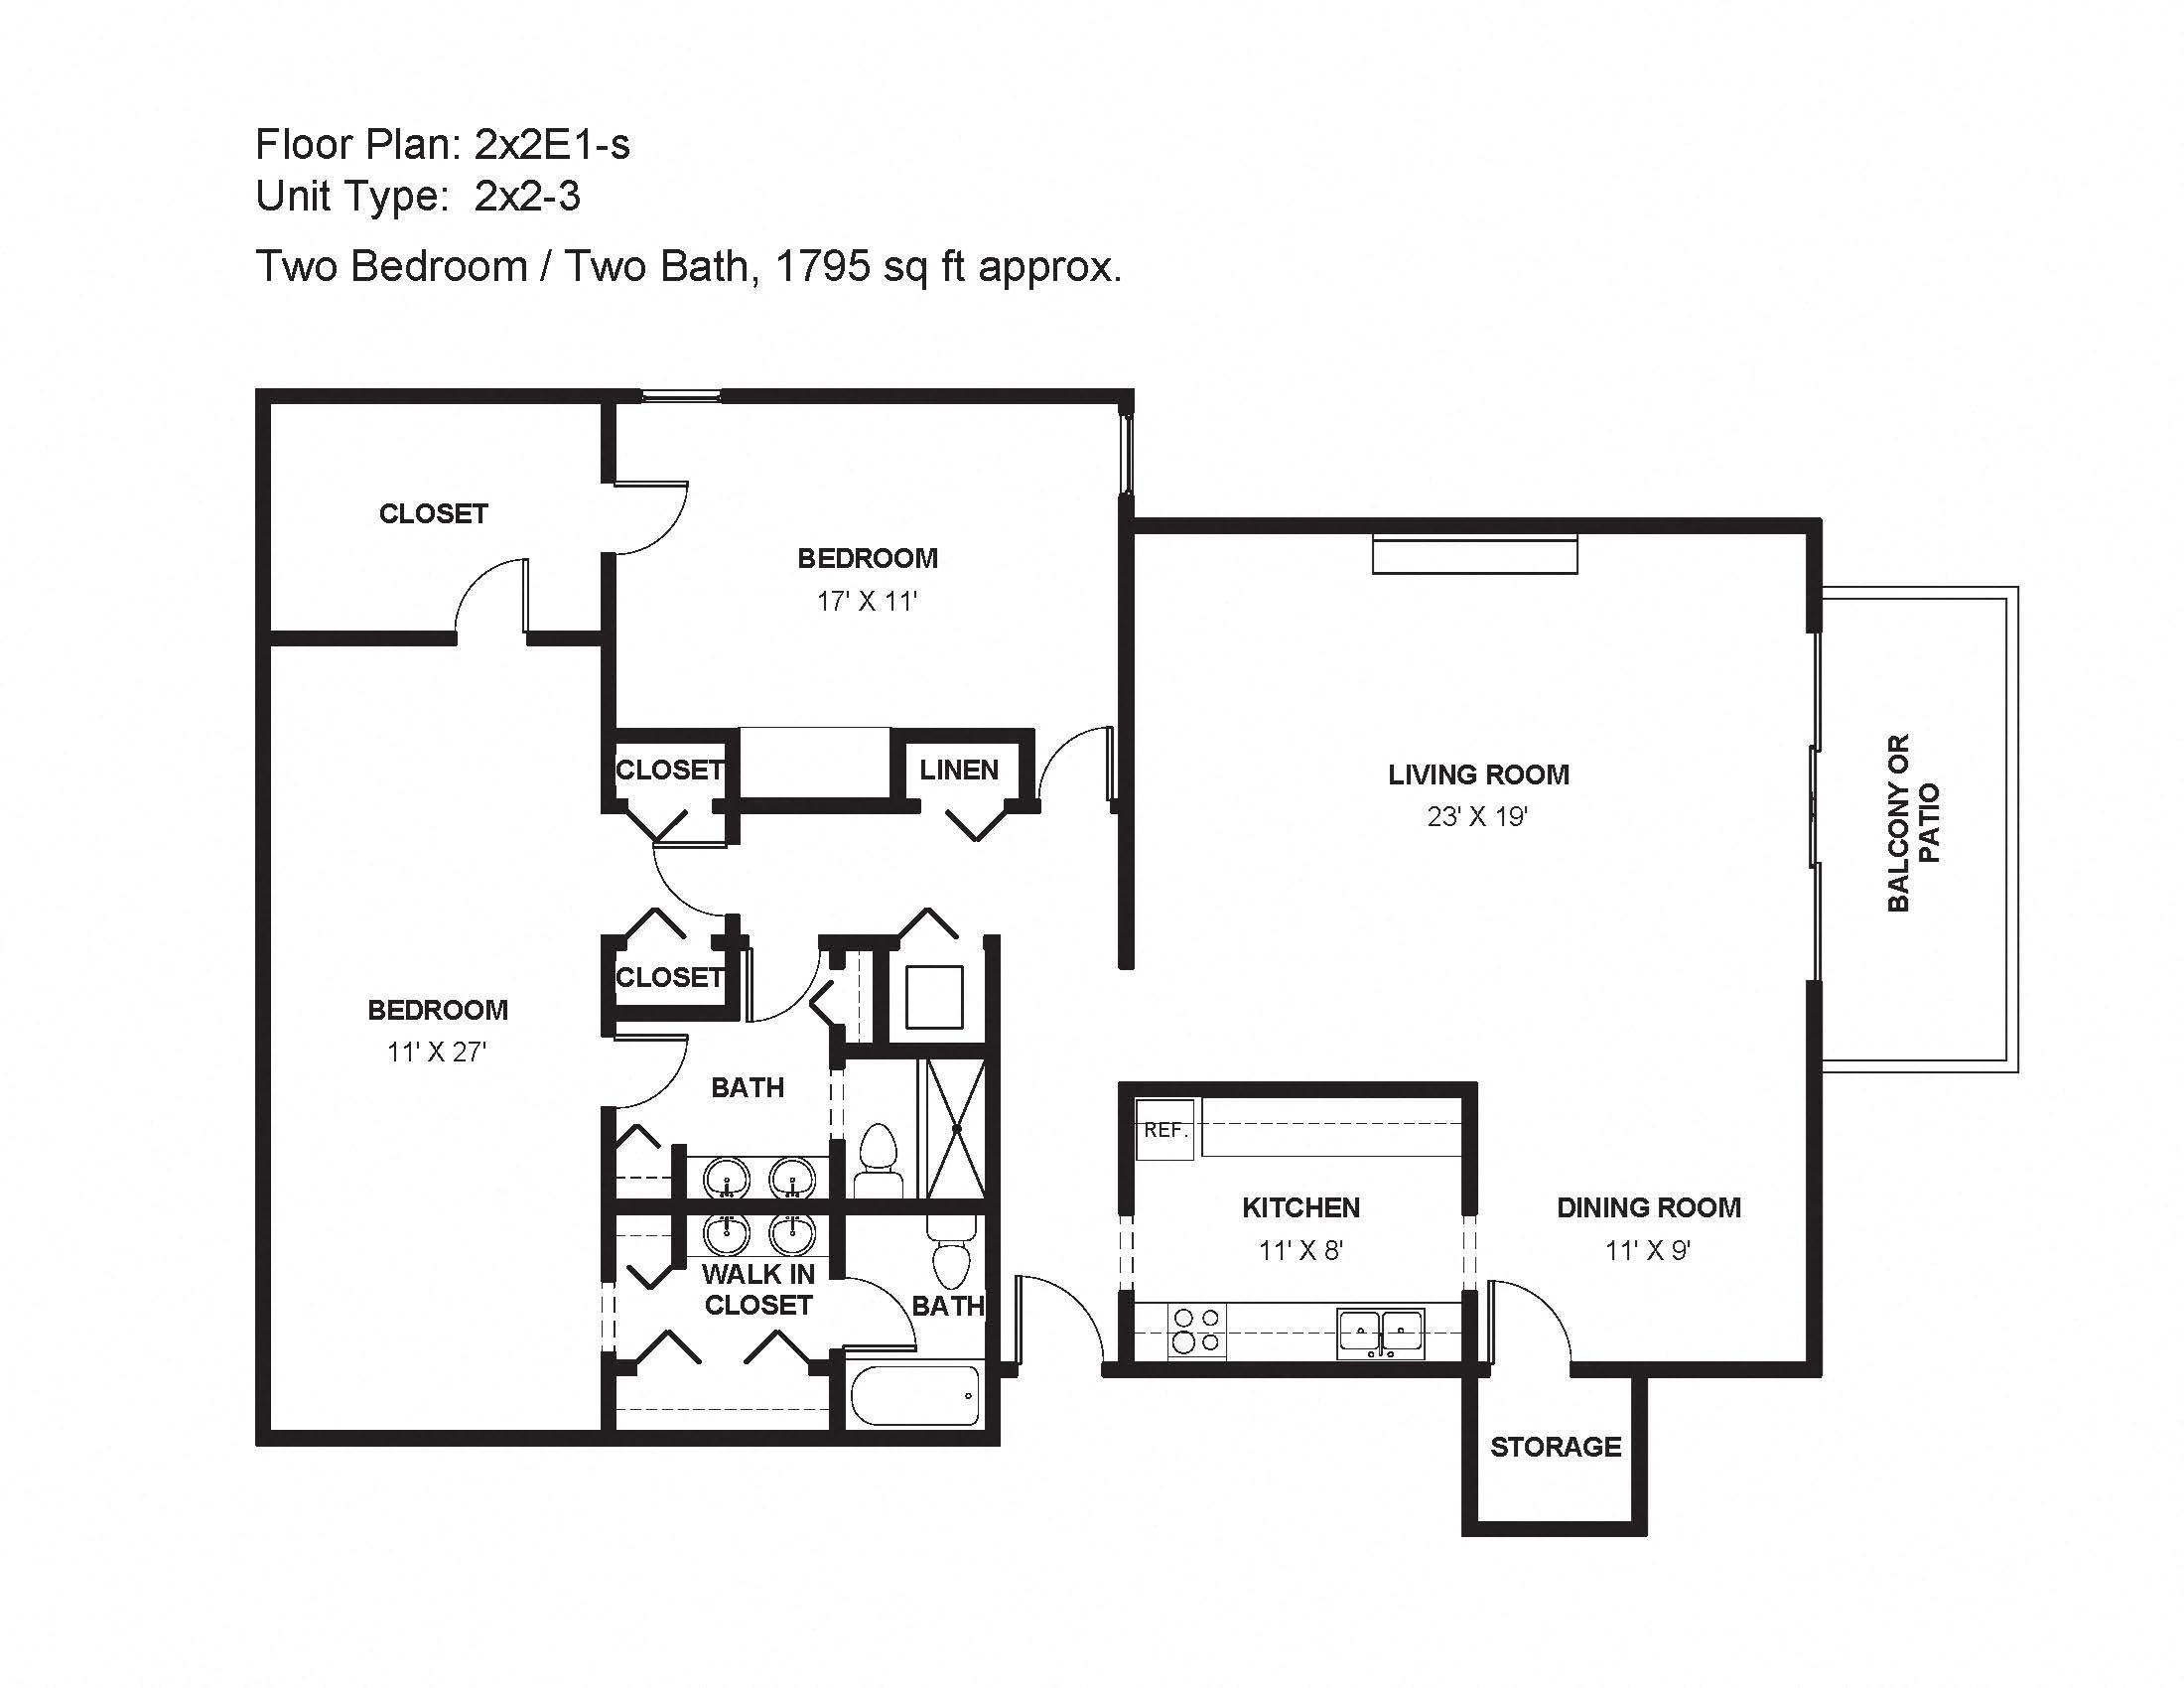 2x2E1-s Floor Plan 28